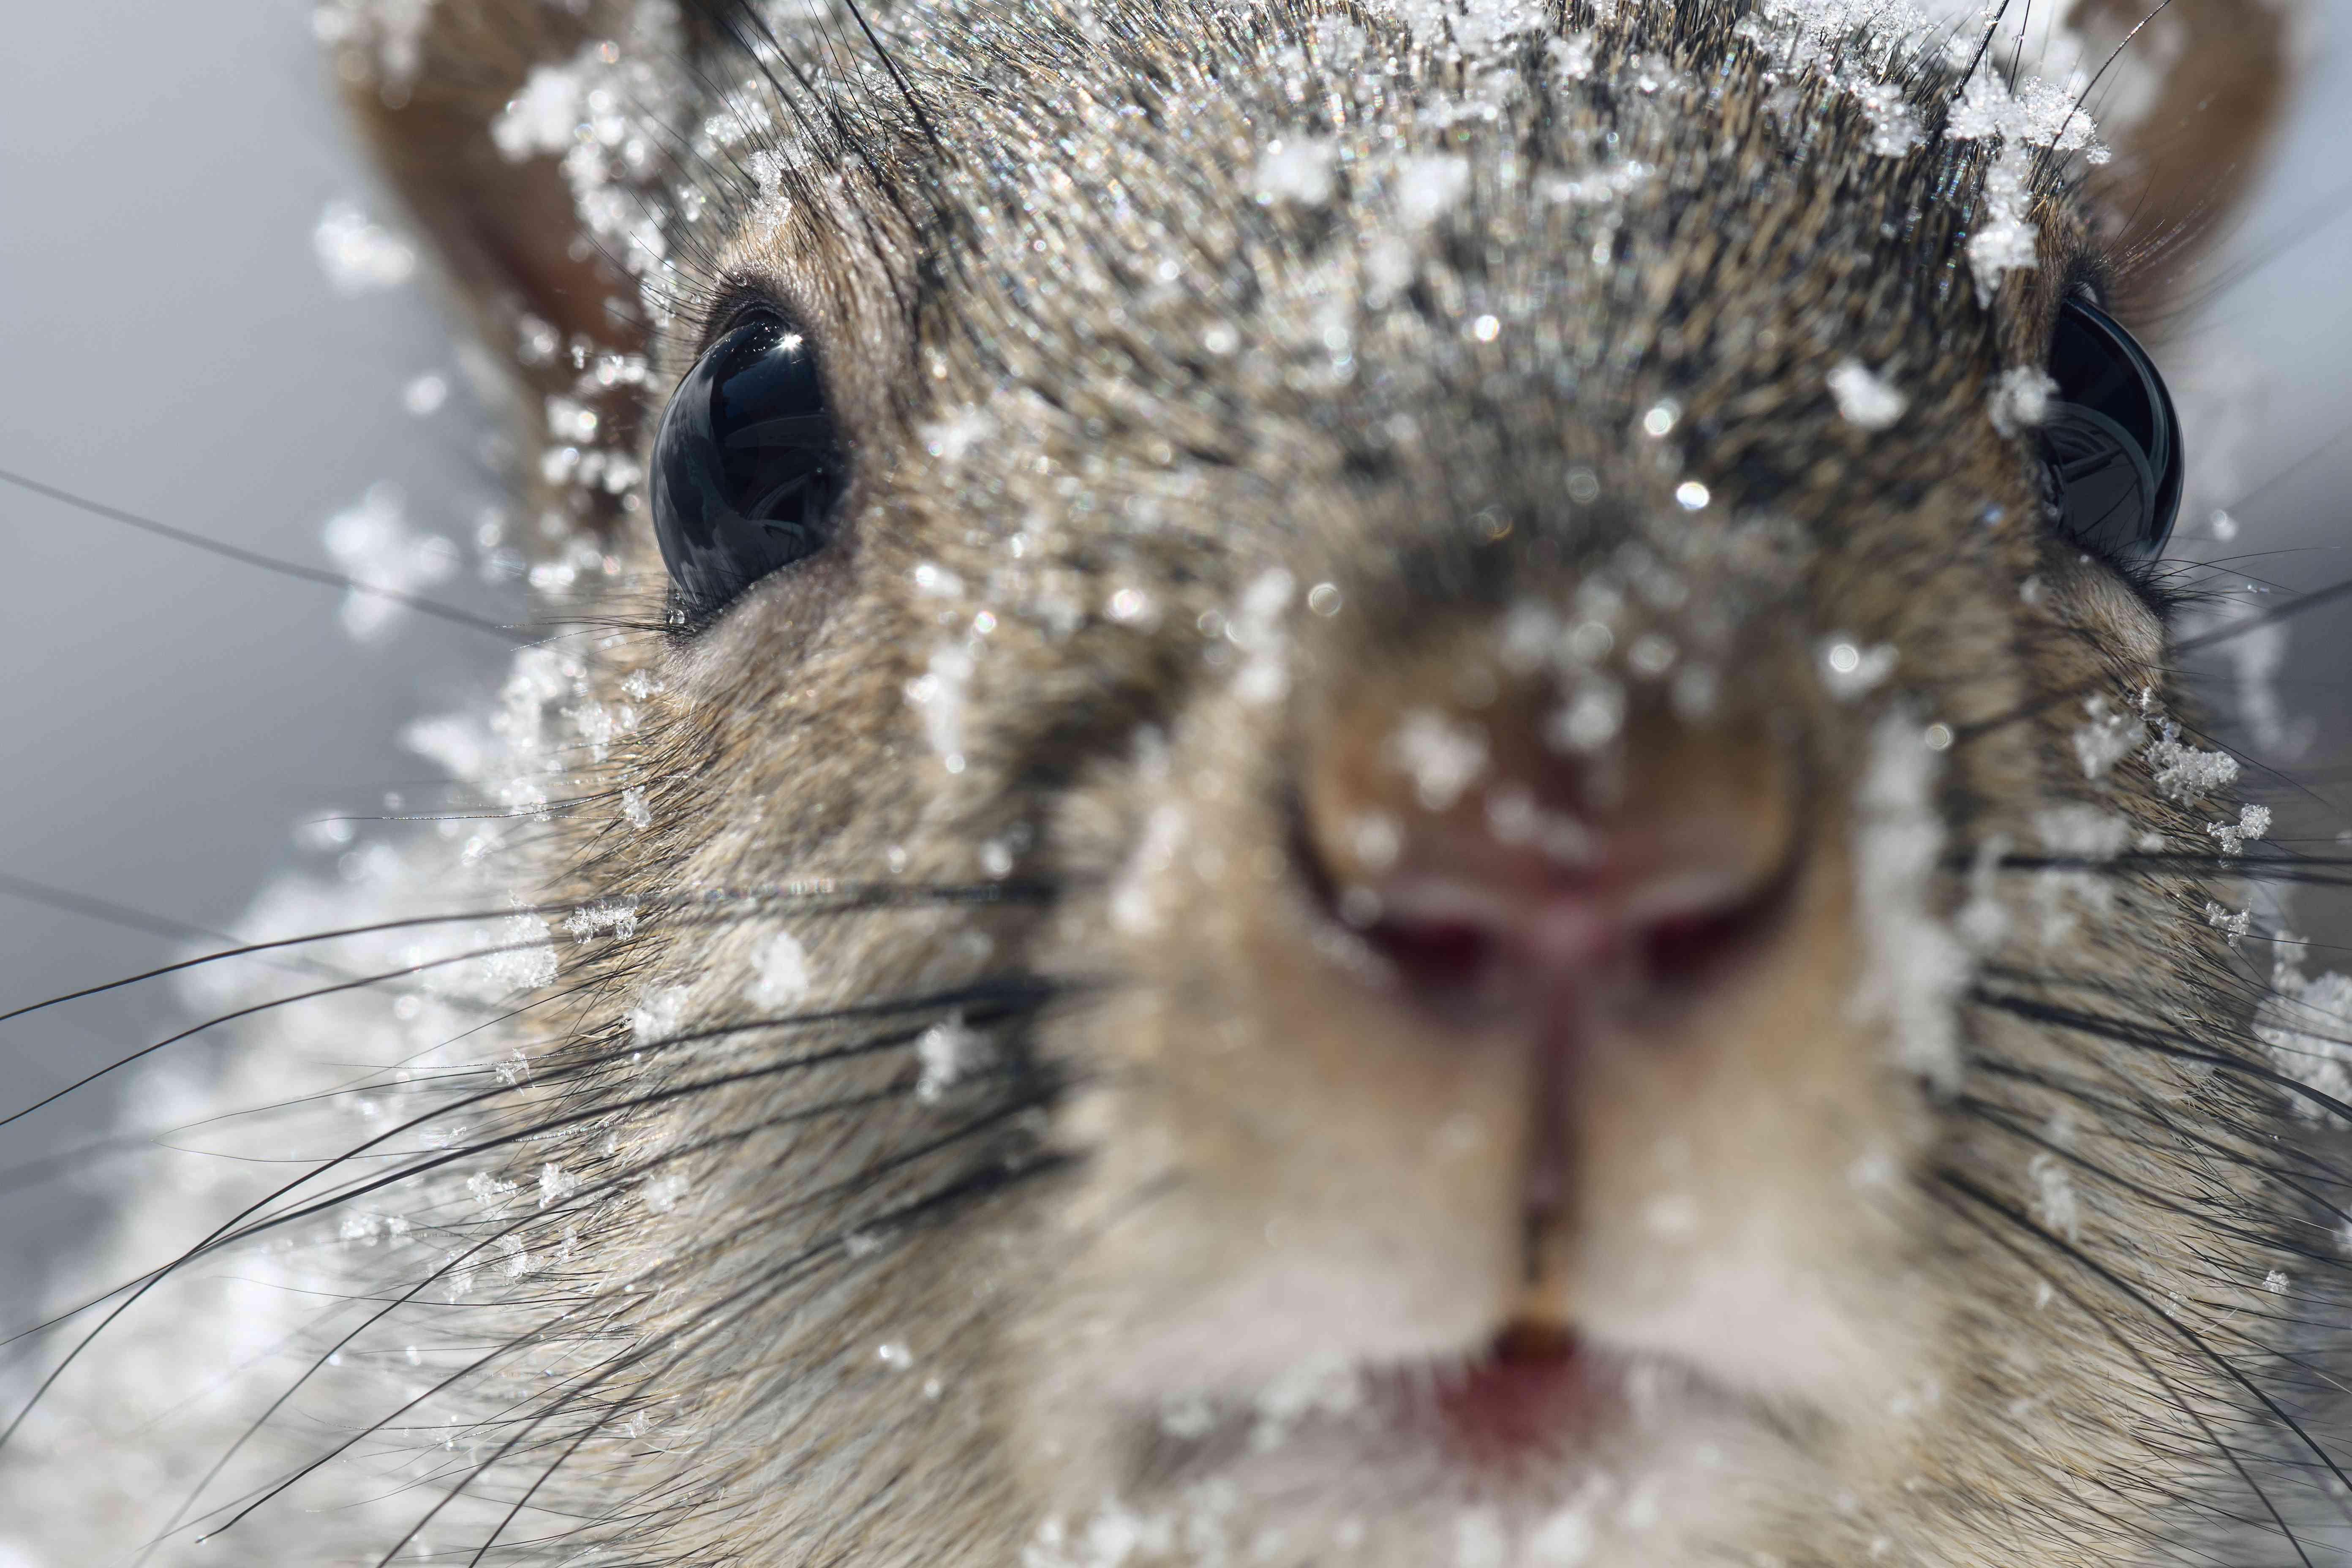 eastern gray squirrel closeup in winter